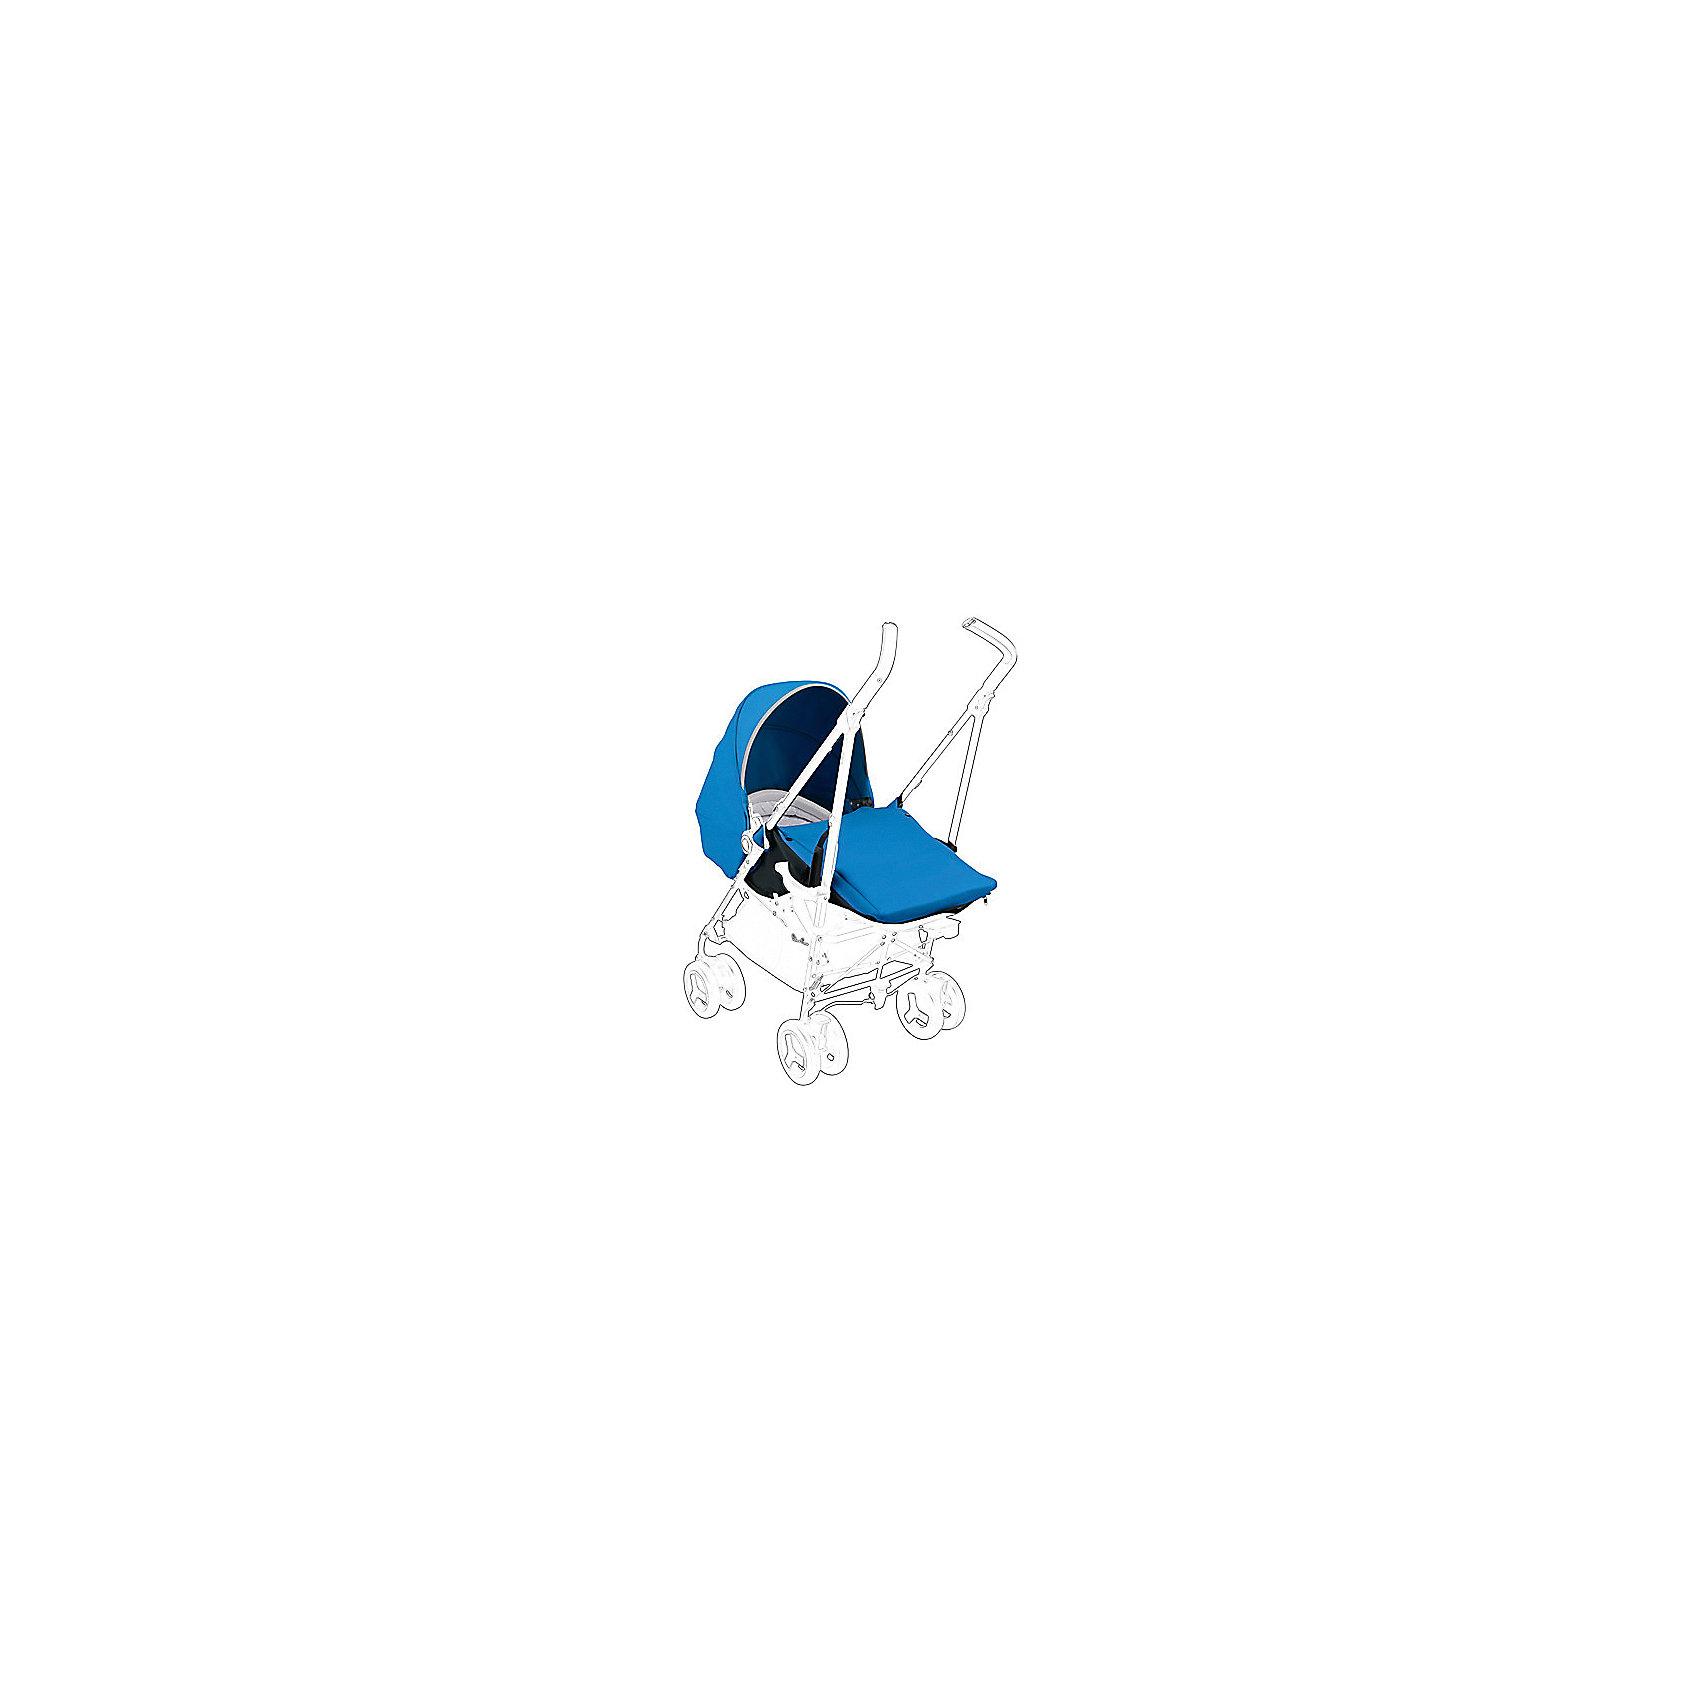 Silver Cross Доп. комплект для коляски Reflex, Silver Cross, голубой